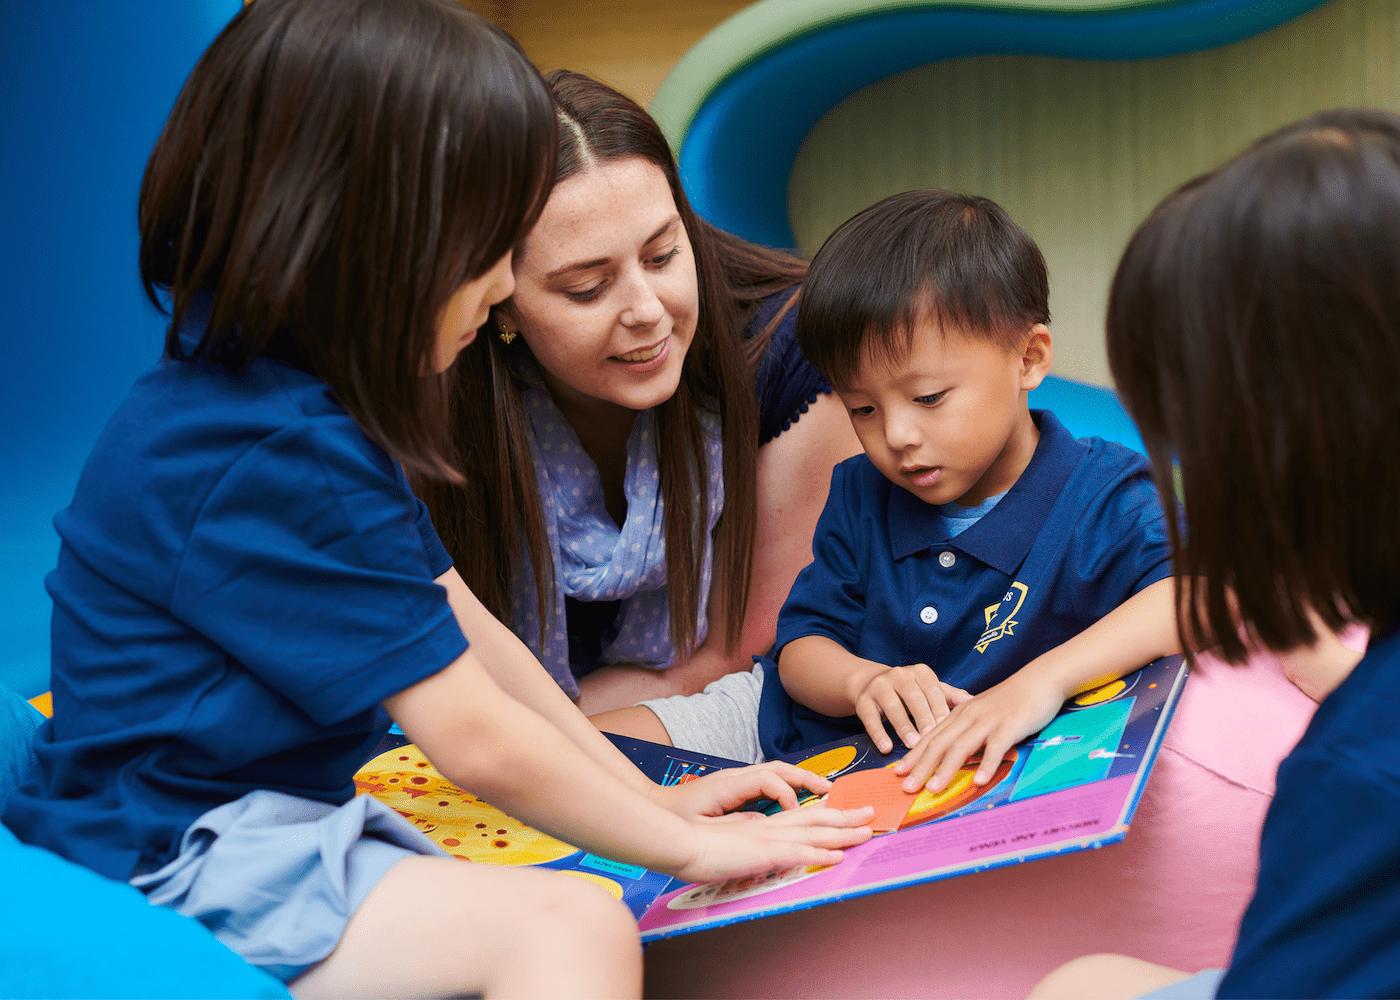 Invictus | Is preschool really worth it?